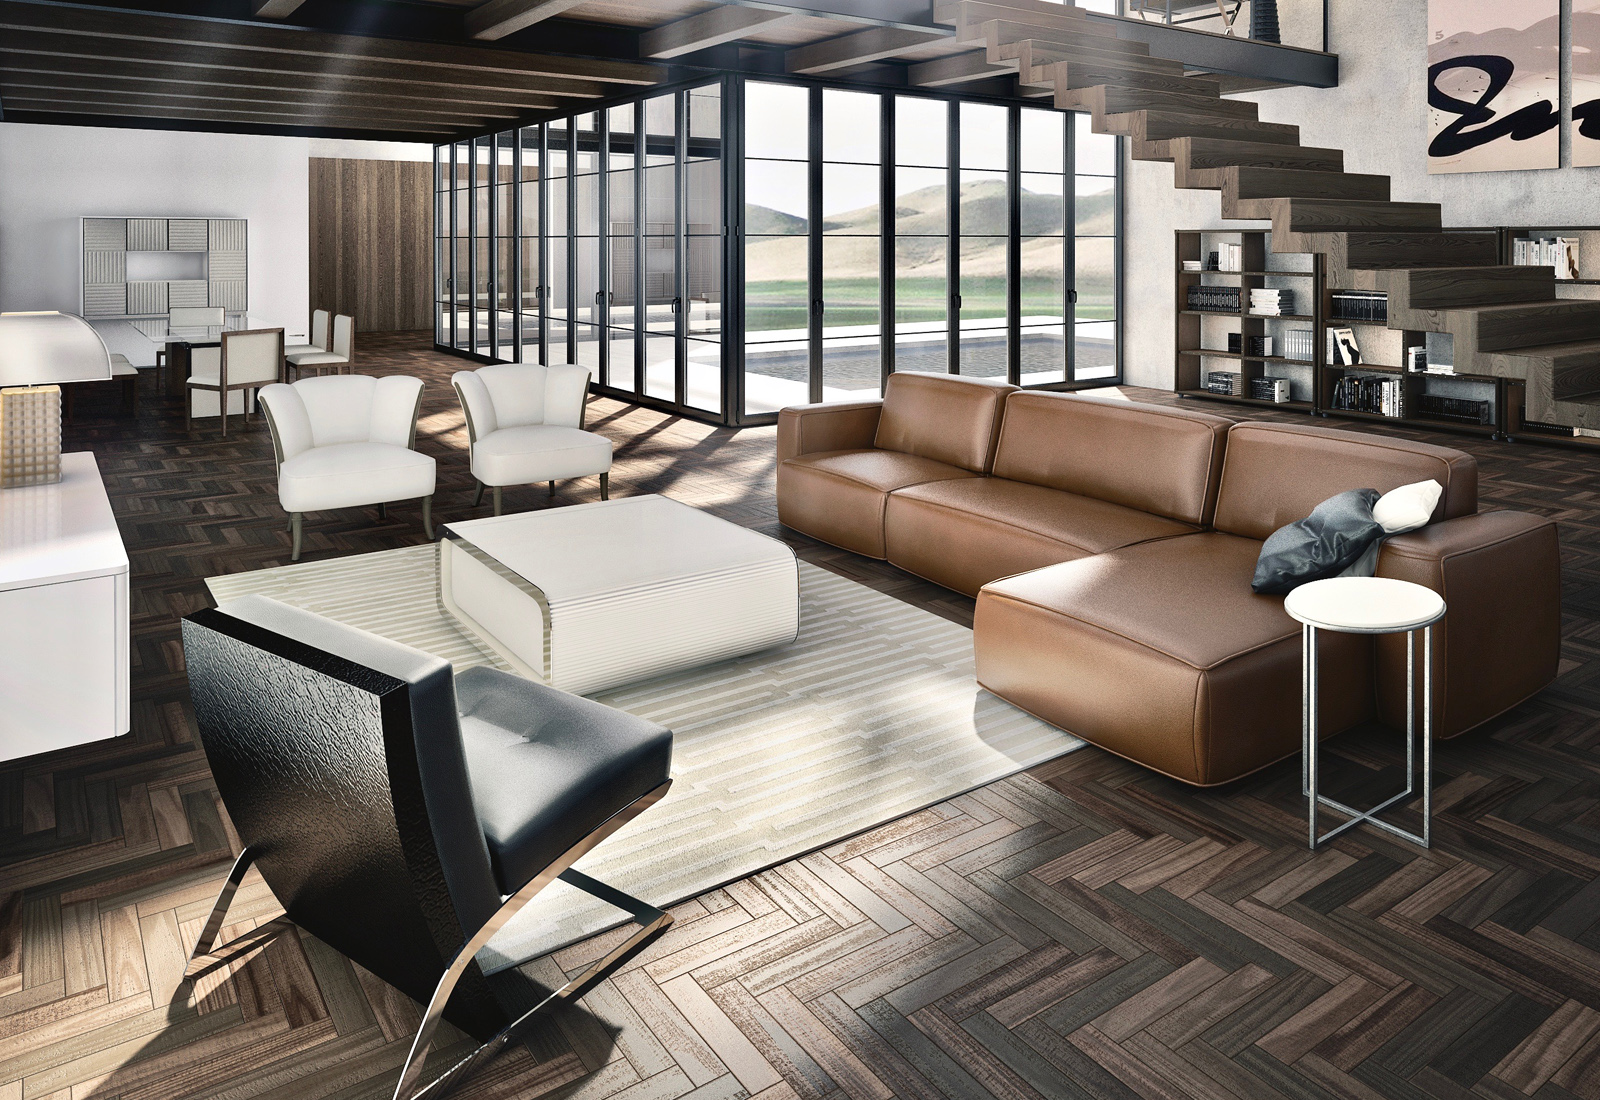 Image of: Luxury Living Room Furniture Sets